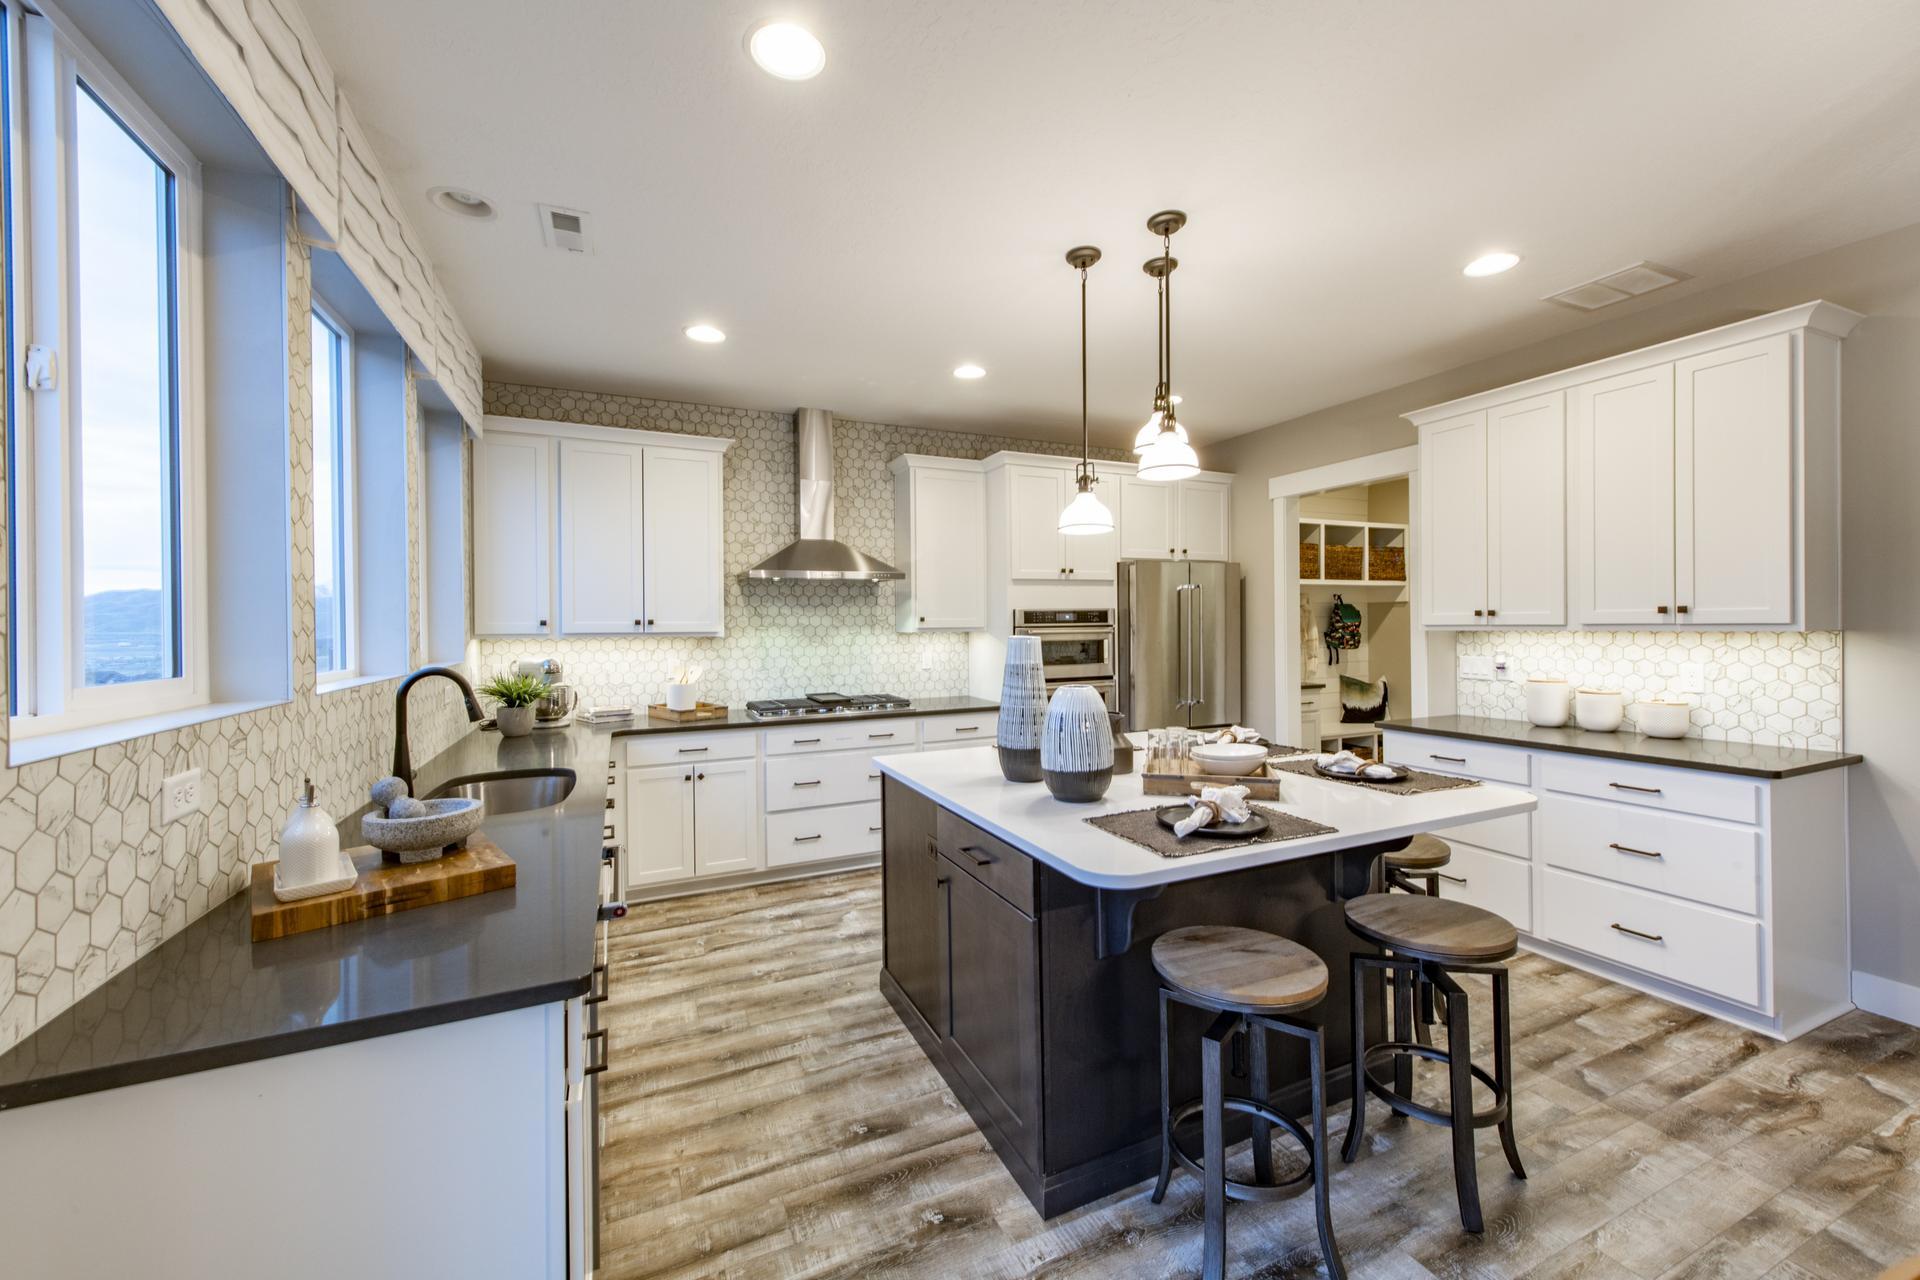 New Home for sale 2073 Northridge Dr, Lehi, UT